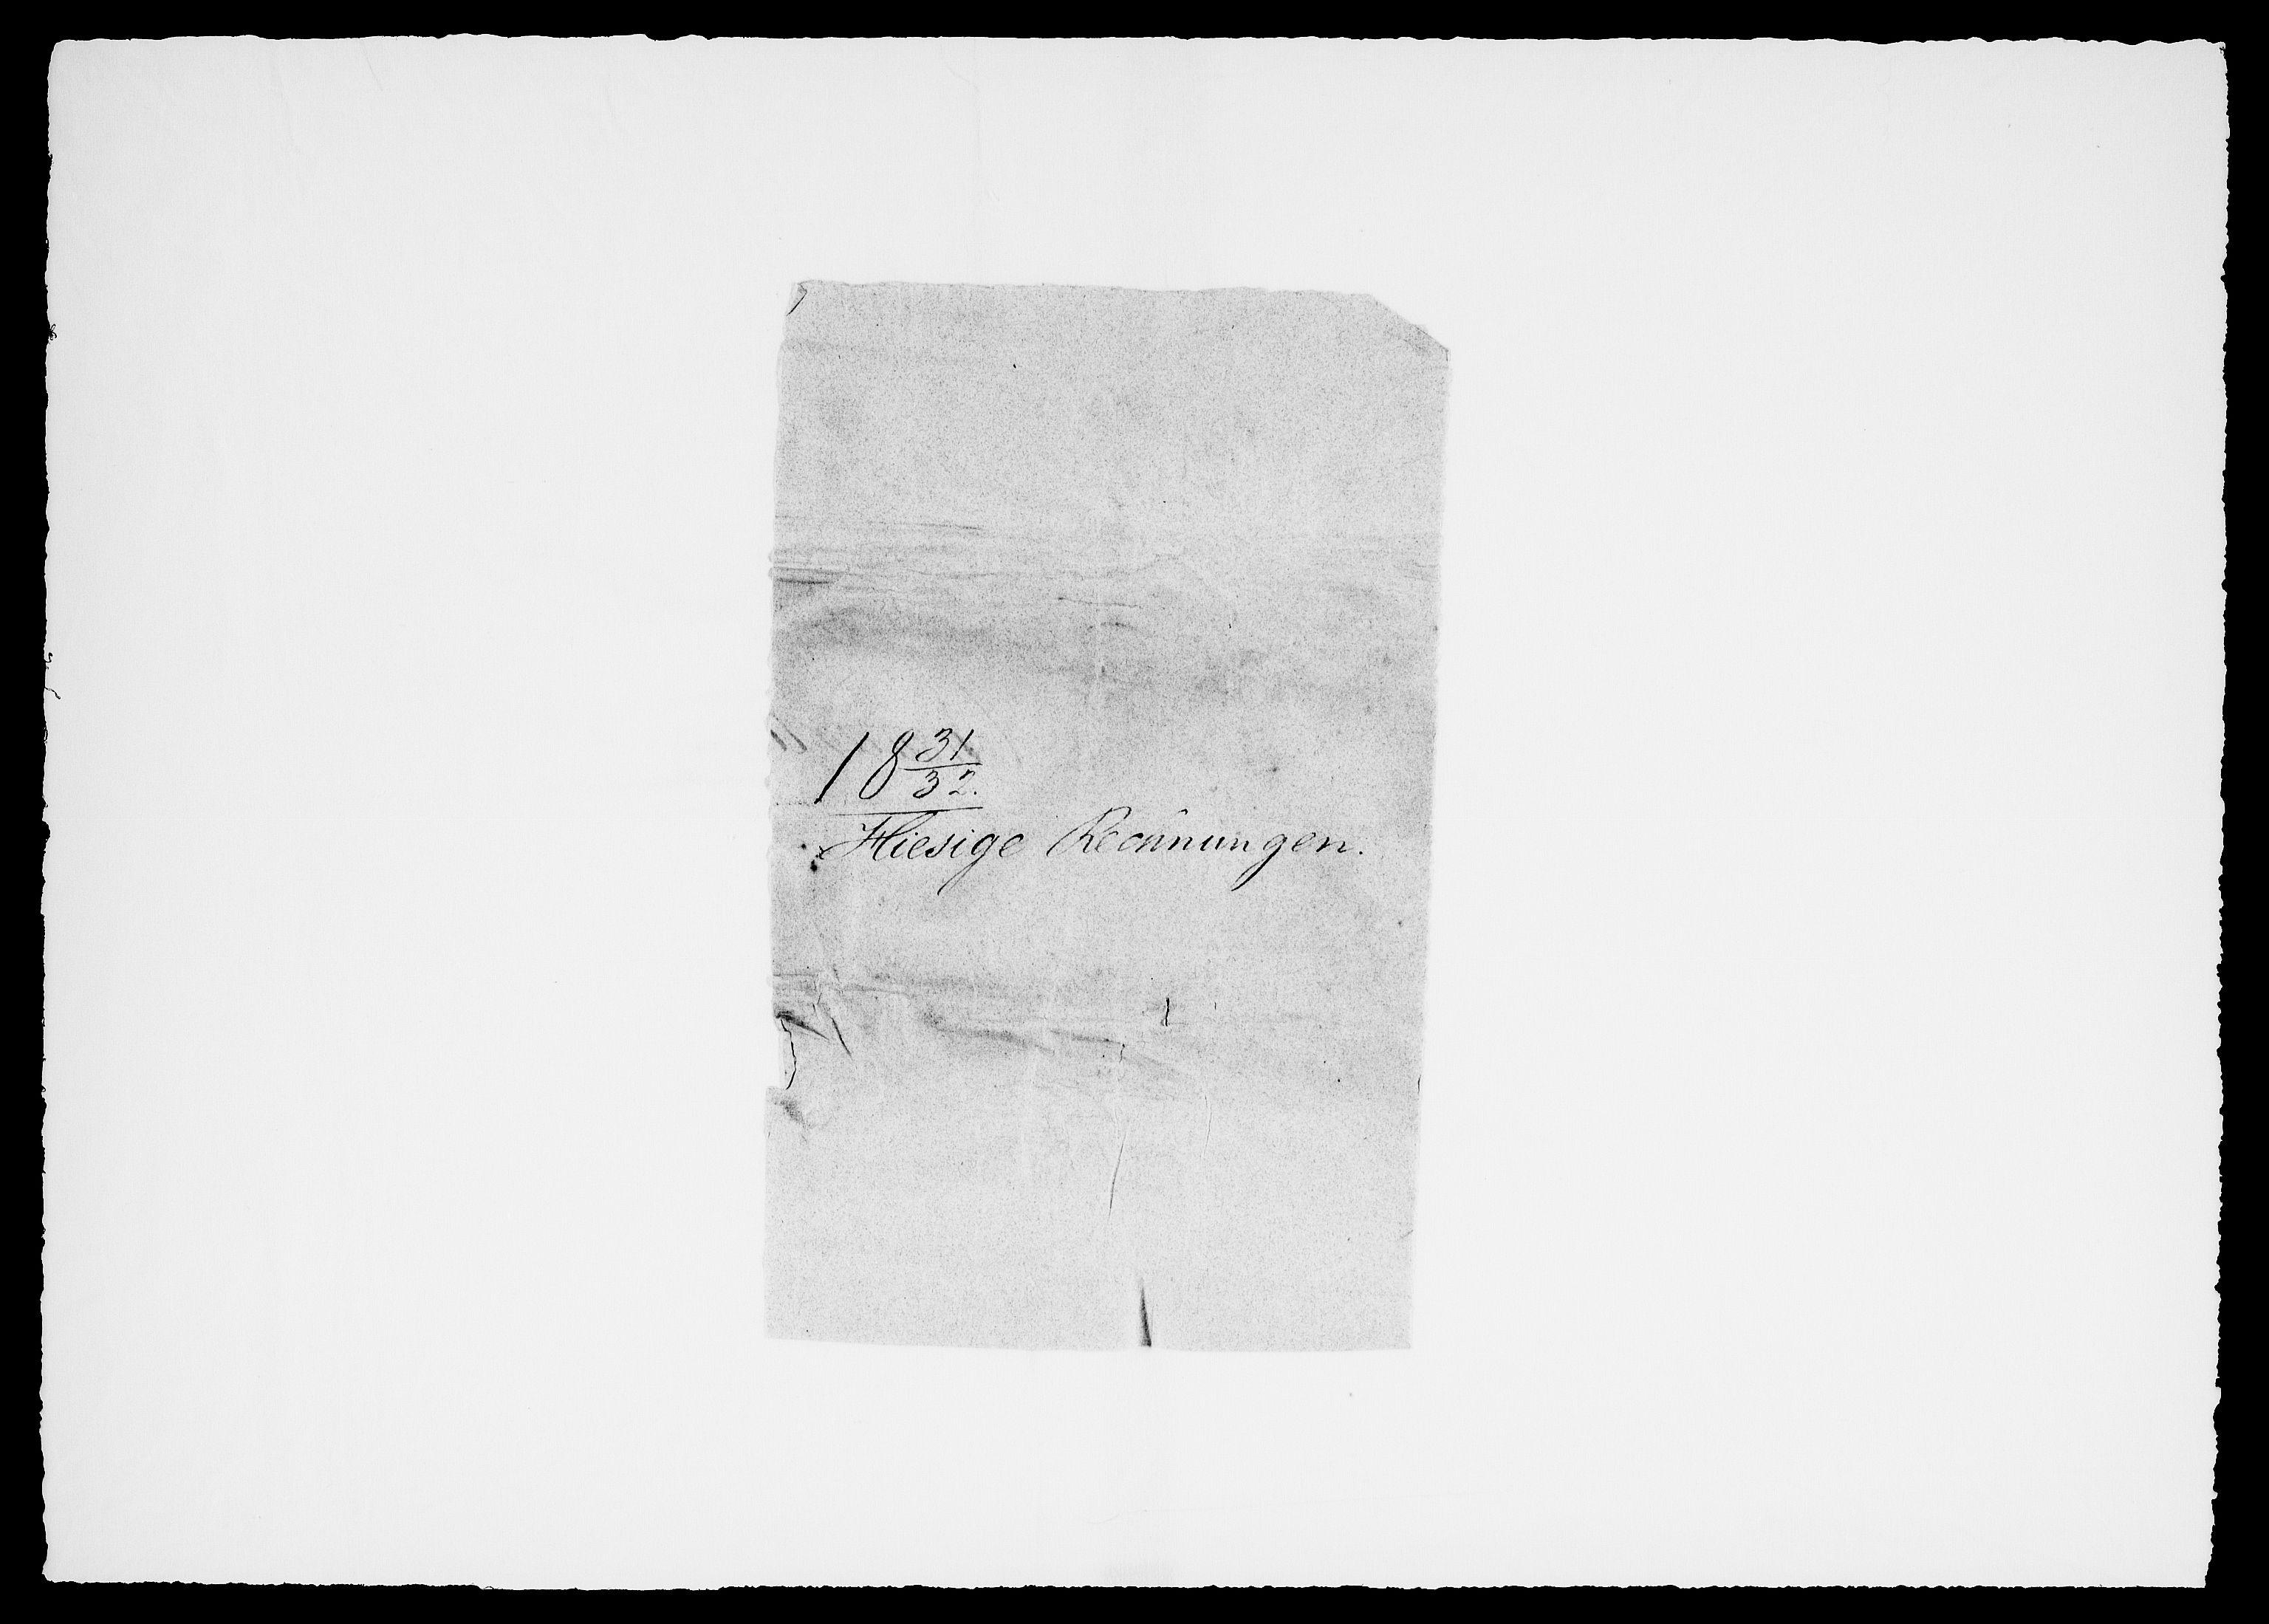 RA, Modums Blaafarveværk, G/Gd/Gdc/L0217, 1831-1834, s. 2